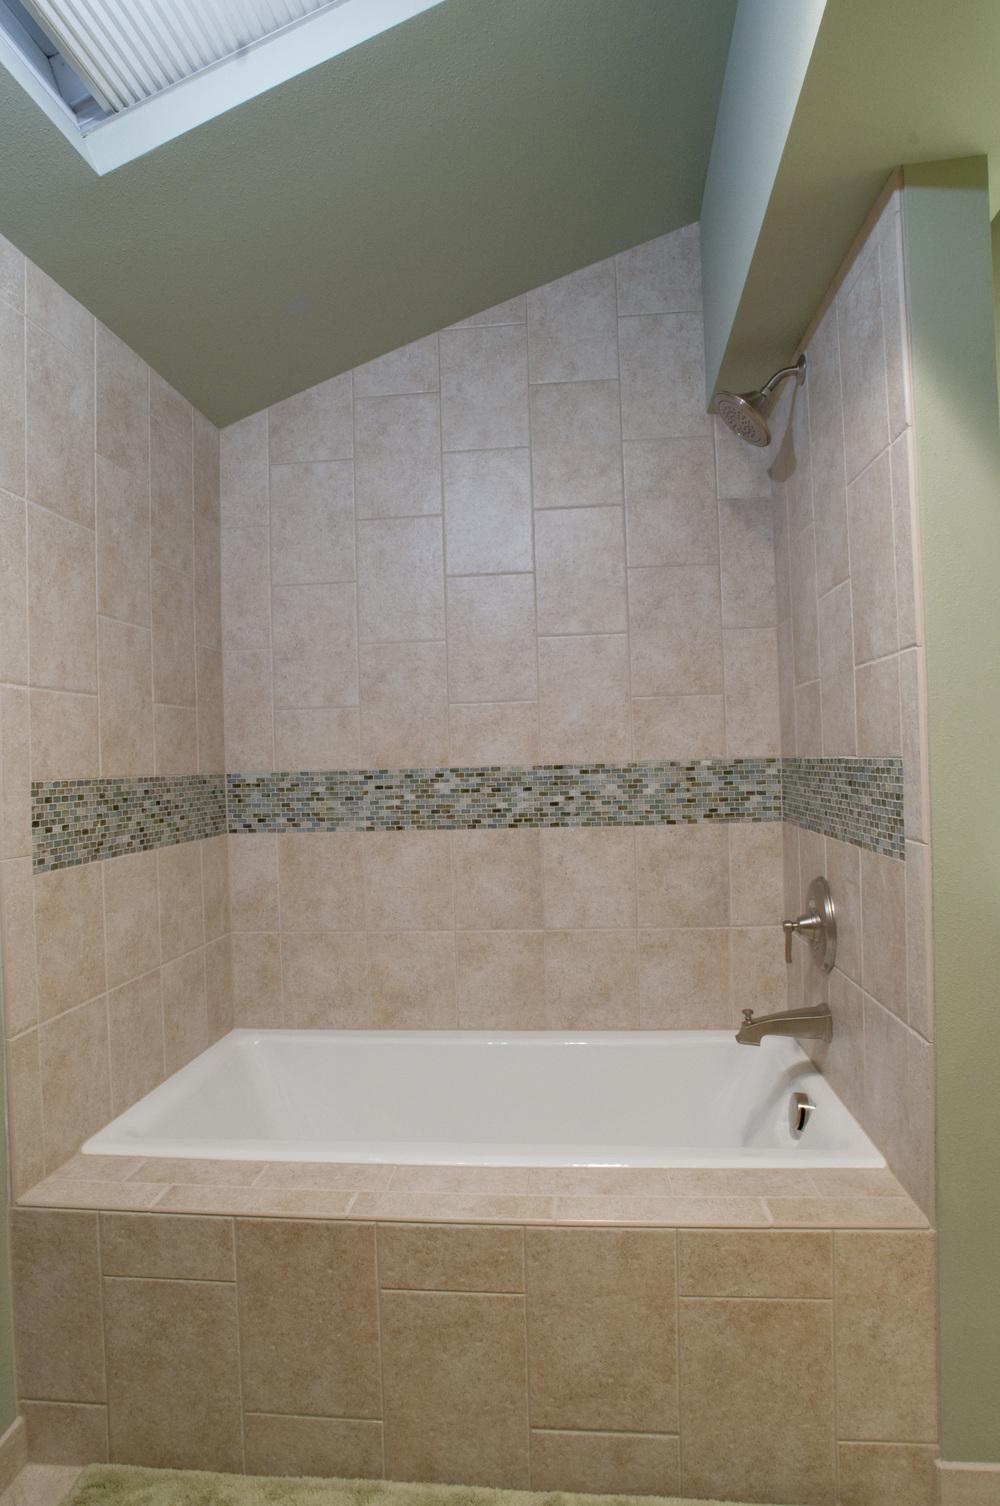 After: New Extra deep soak tub outside Sauna room